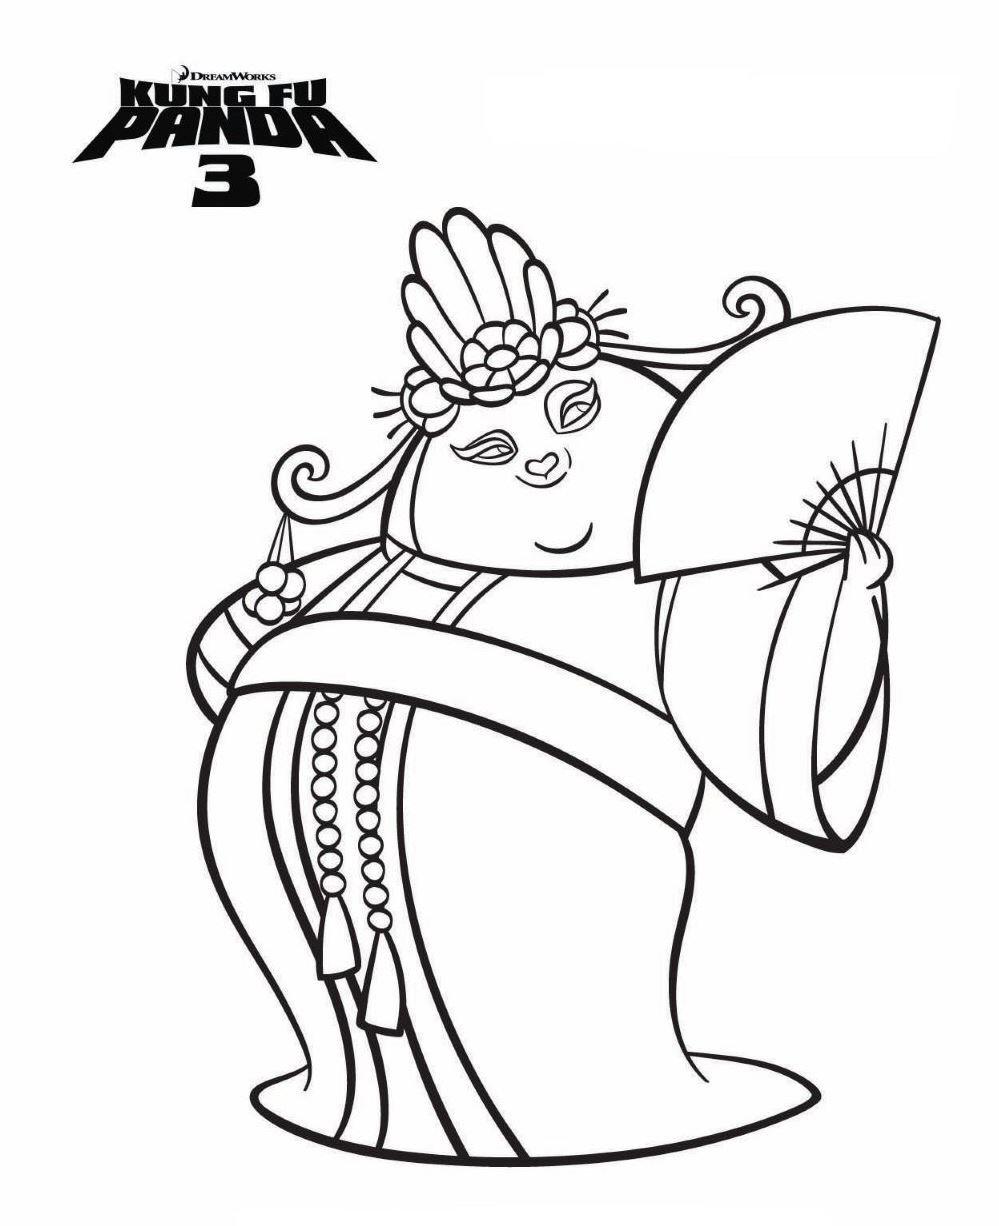 999x1226 Kids N 7 Coloring Pages Of Kung Fu Panda 3